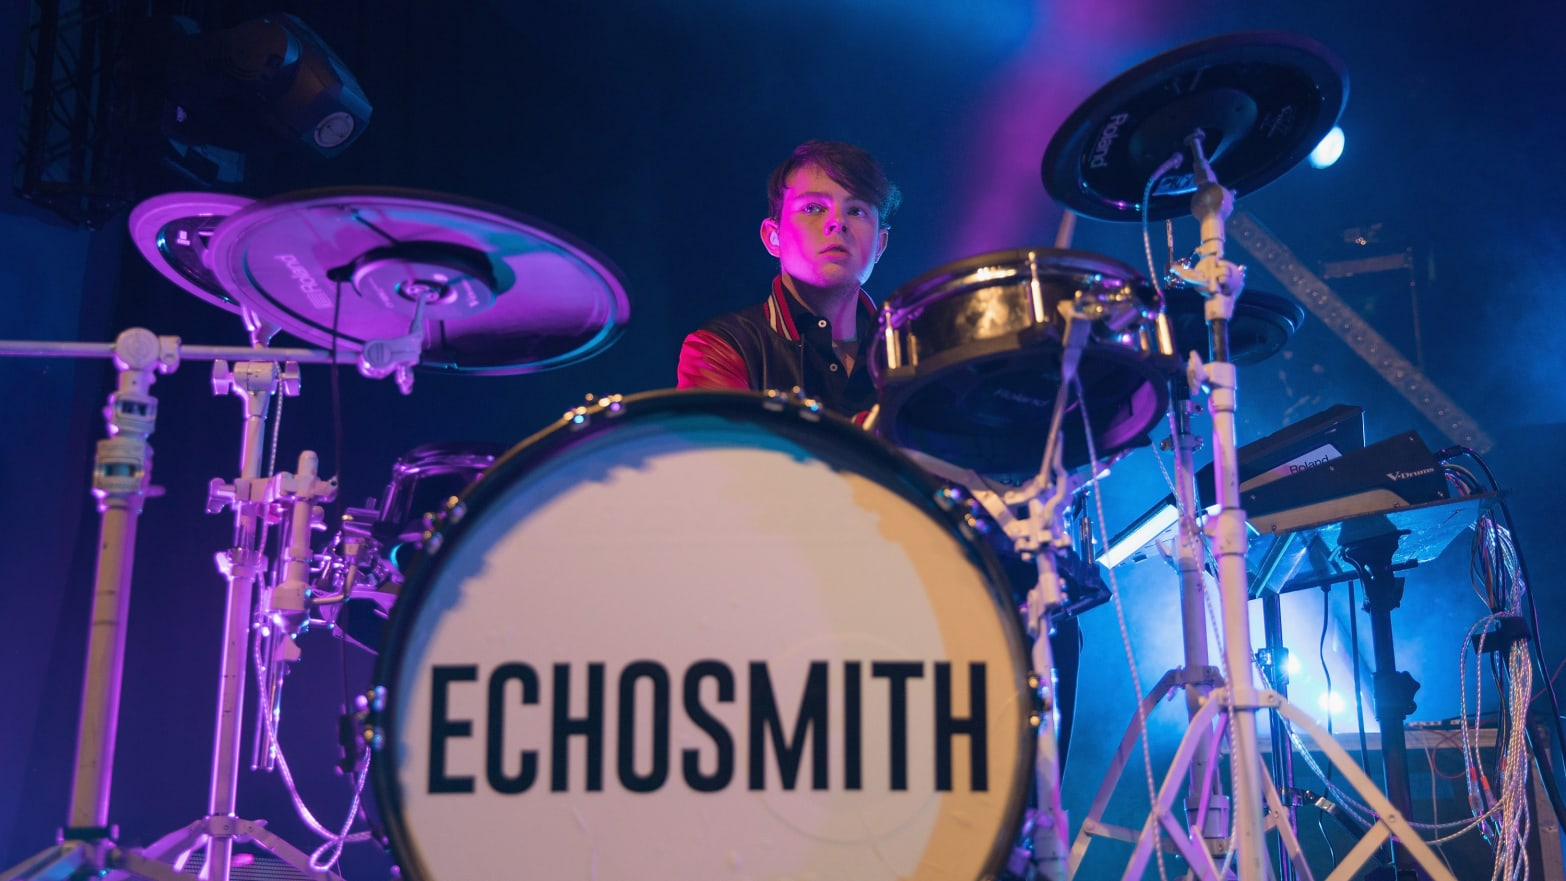 Echosmith Drummer Graham Sierota's Predatory Messages to Travis Barker of Blink-182's 13-Year-Old Daughter